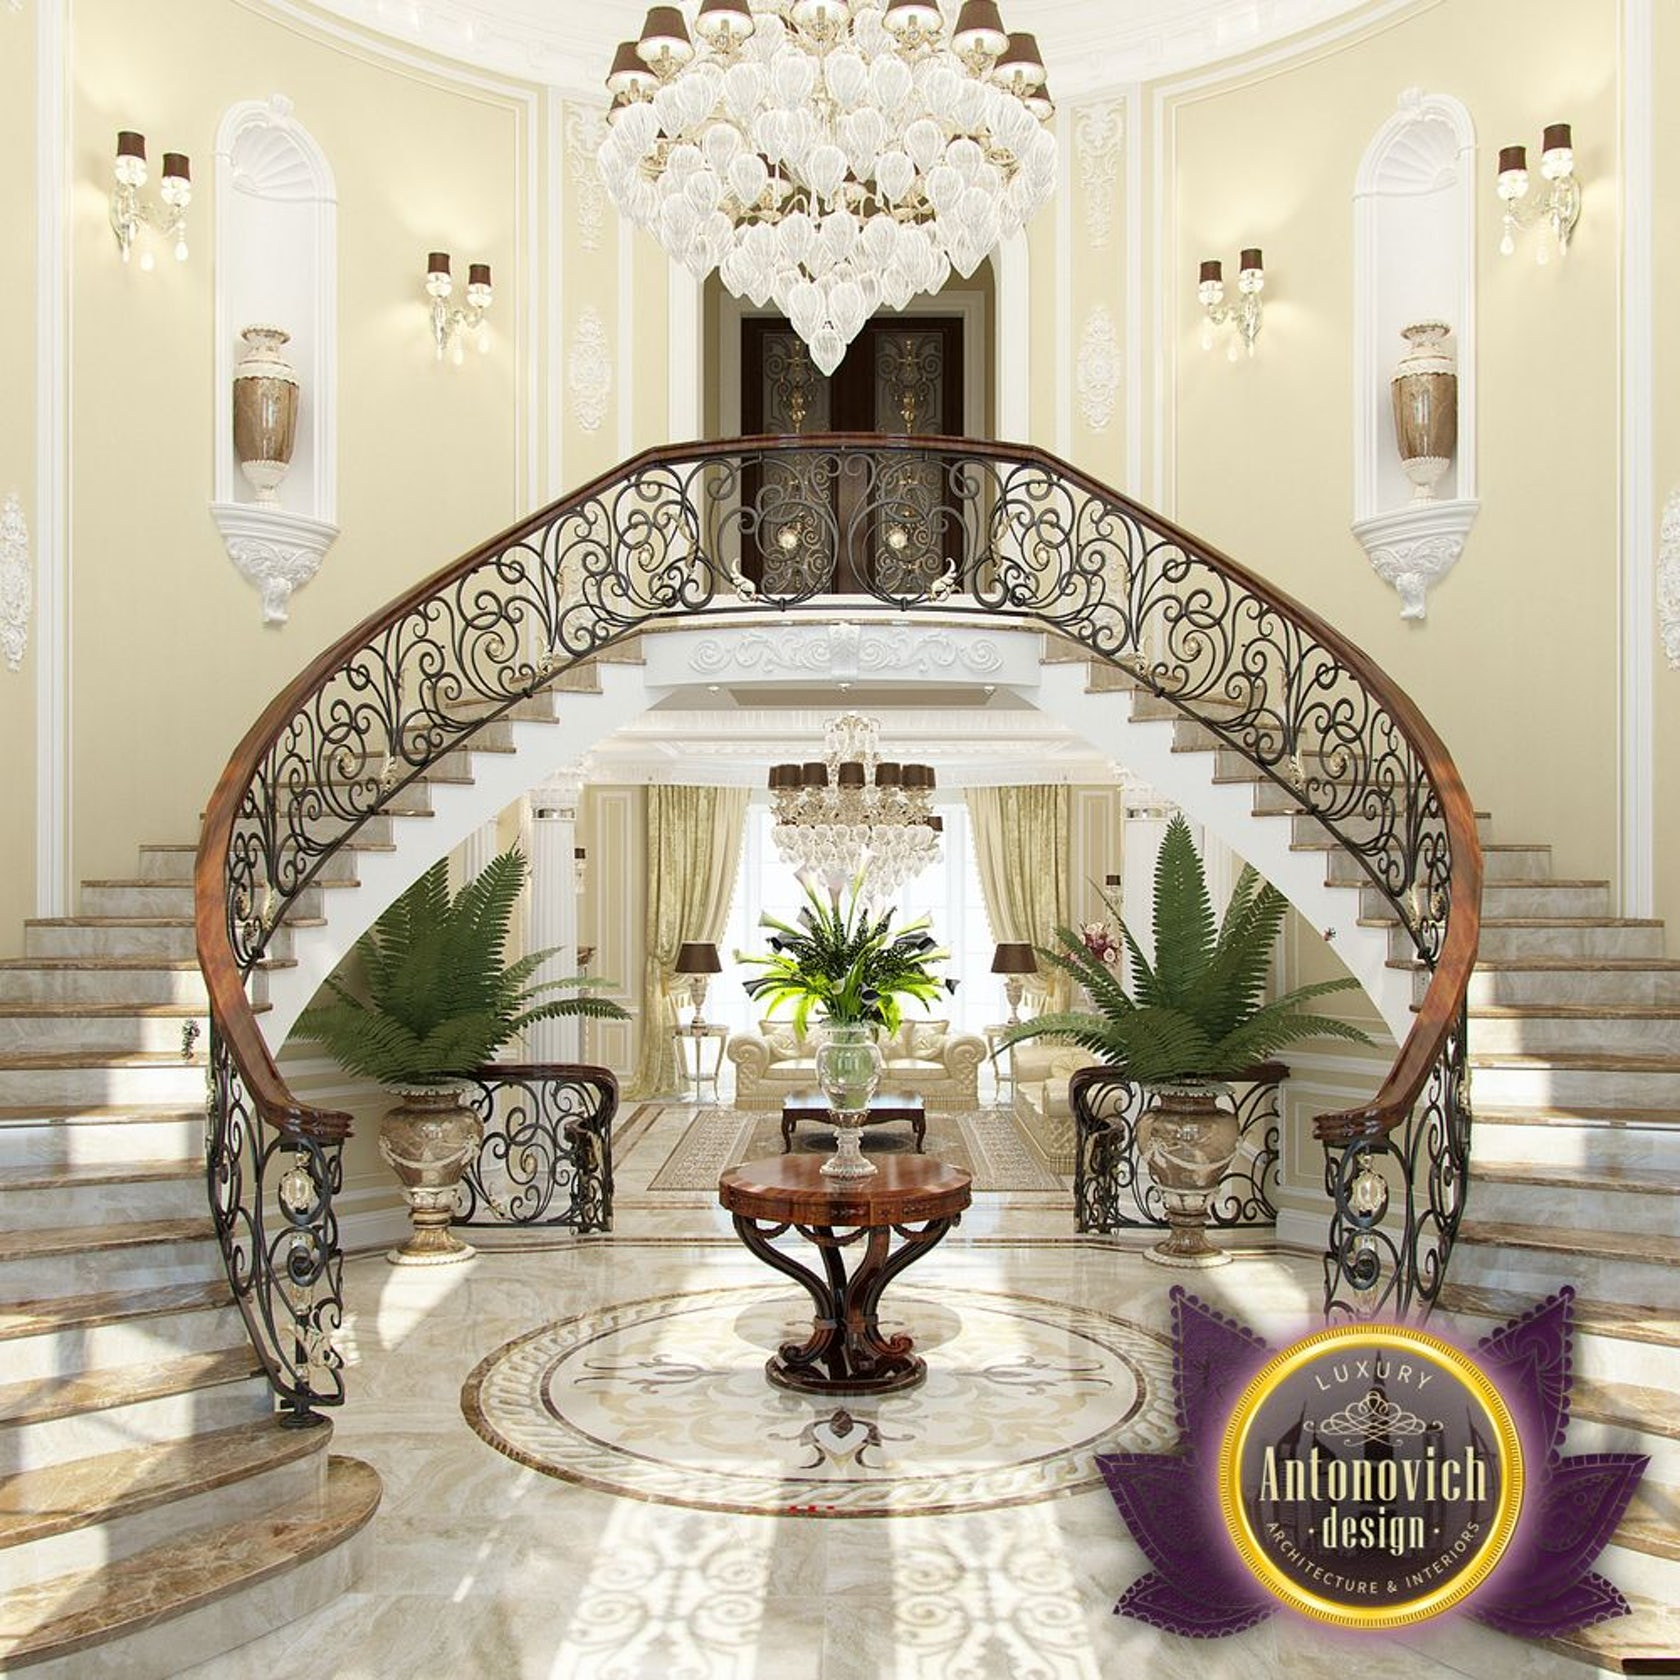 Villa design in uganda from luxury antonovich design on architizer